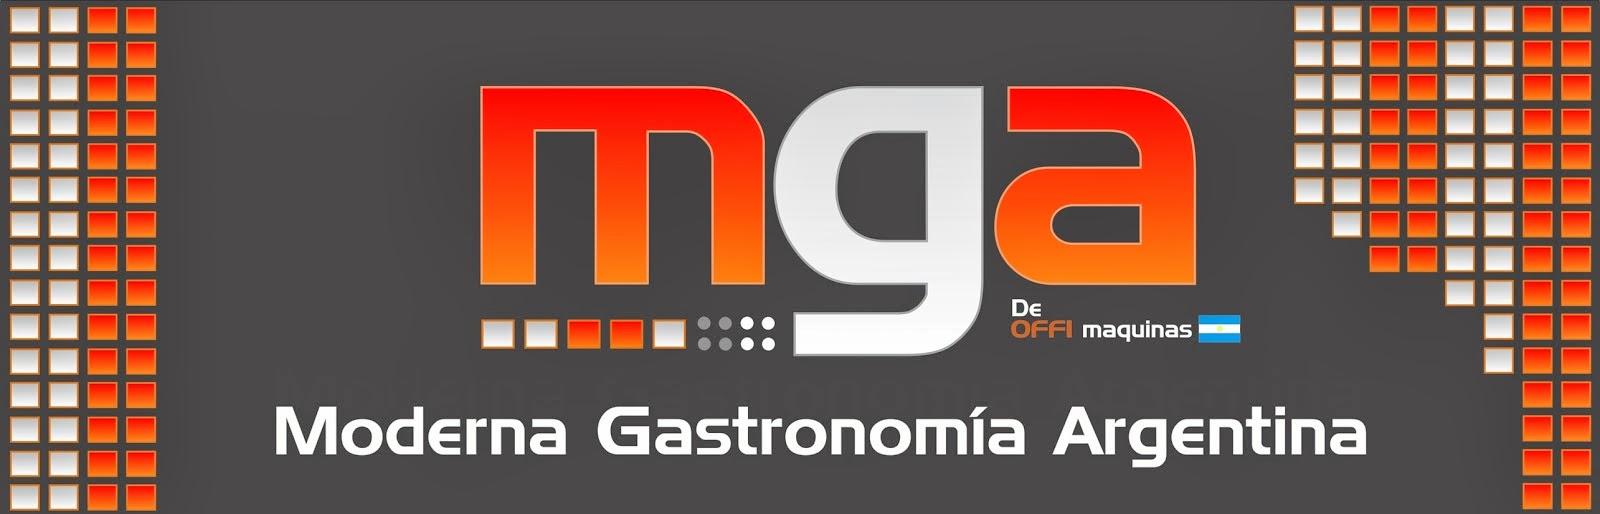 MGA - Moderna gastronomía Argentina